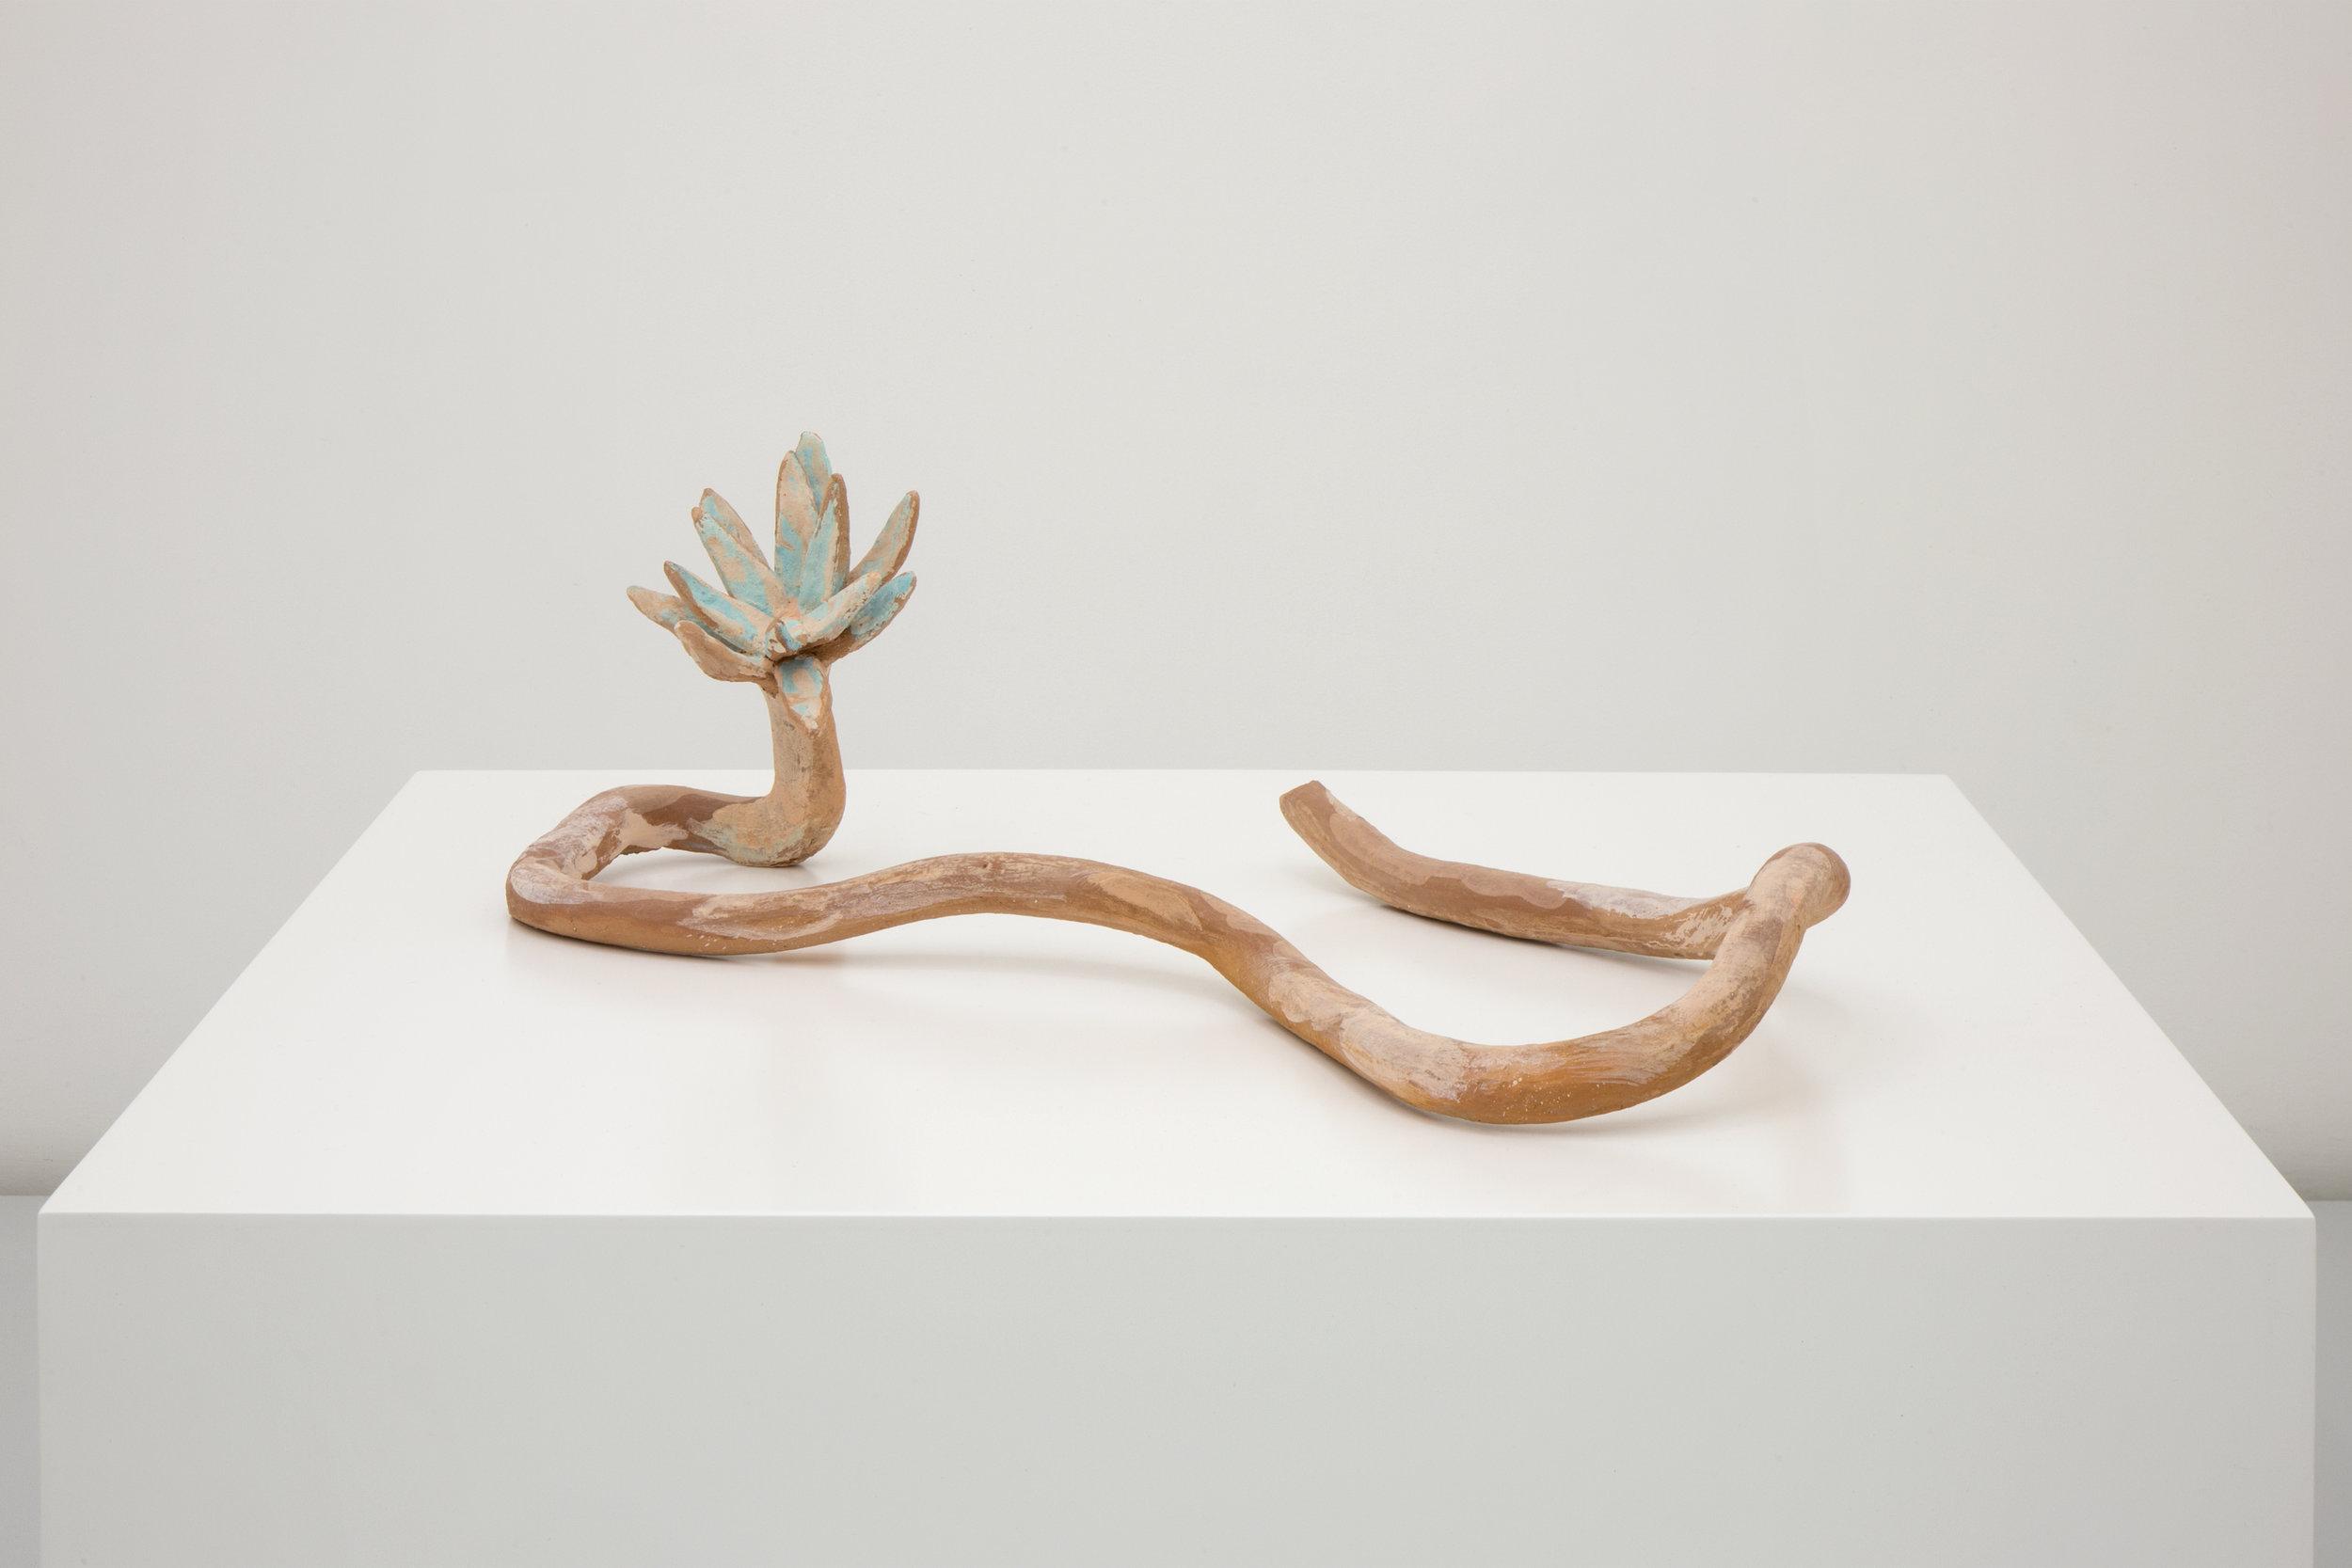 Lorena Ancona, Water Lily, 2018.  Low temperature ceramic